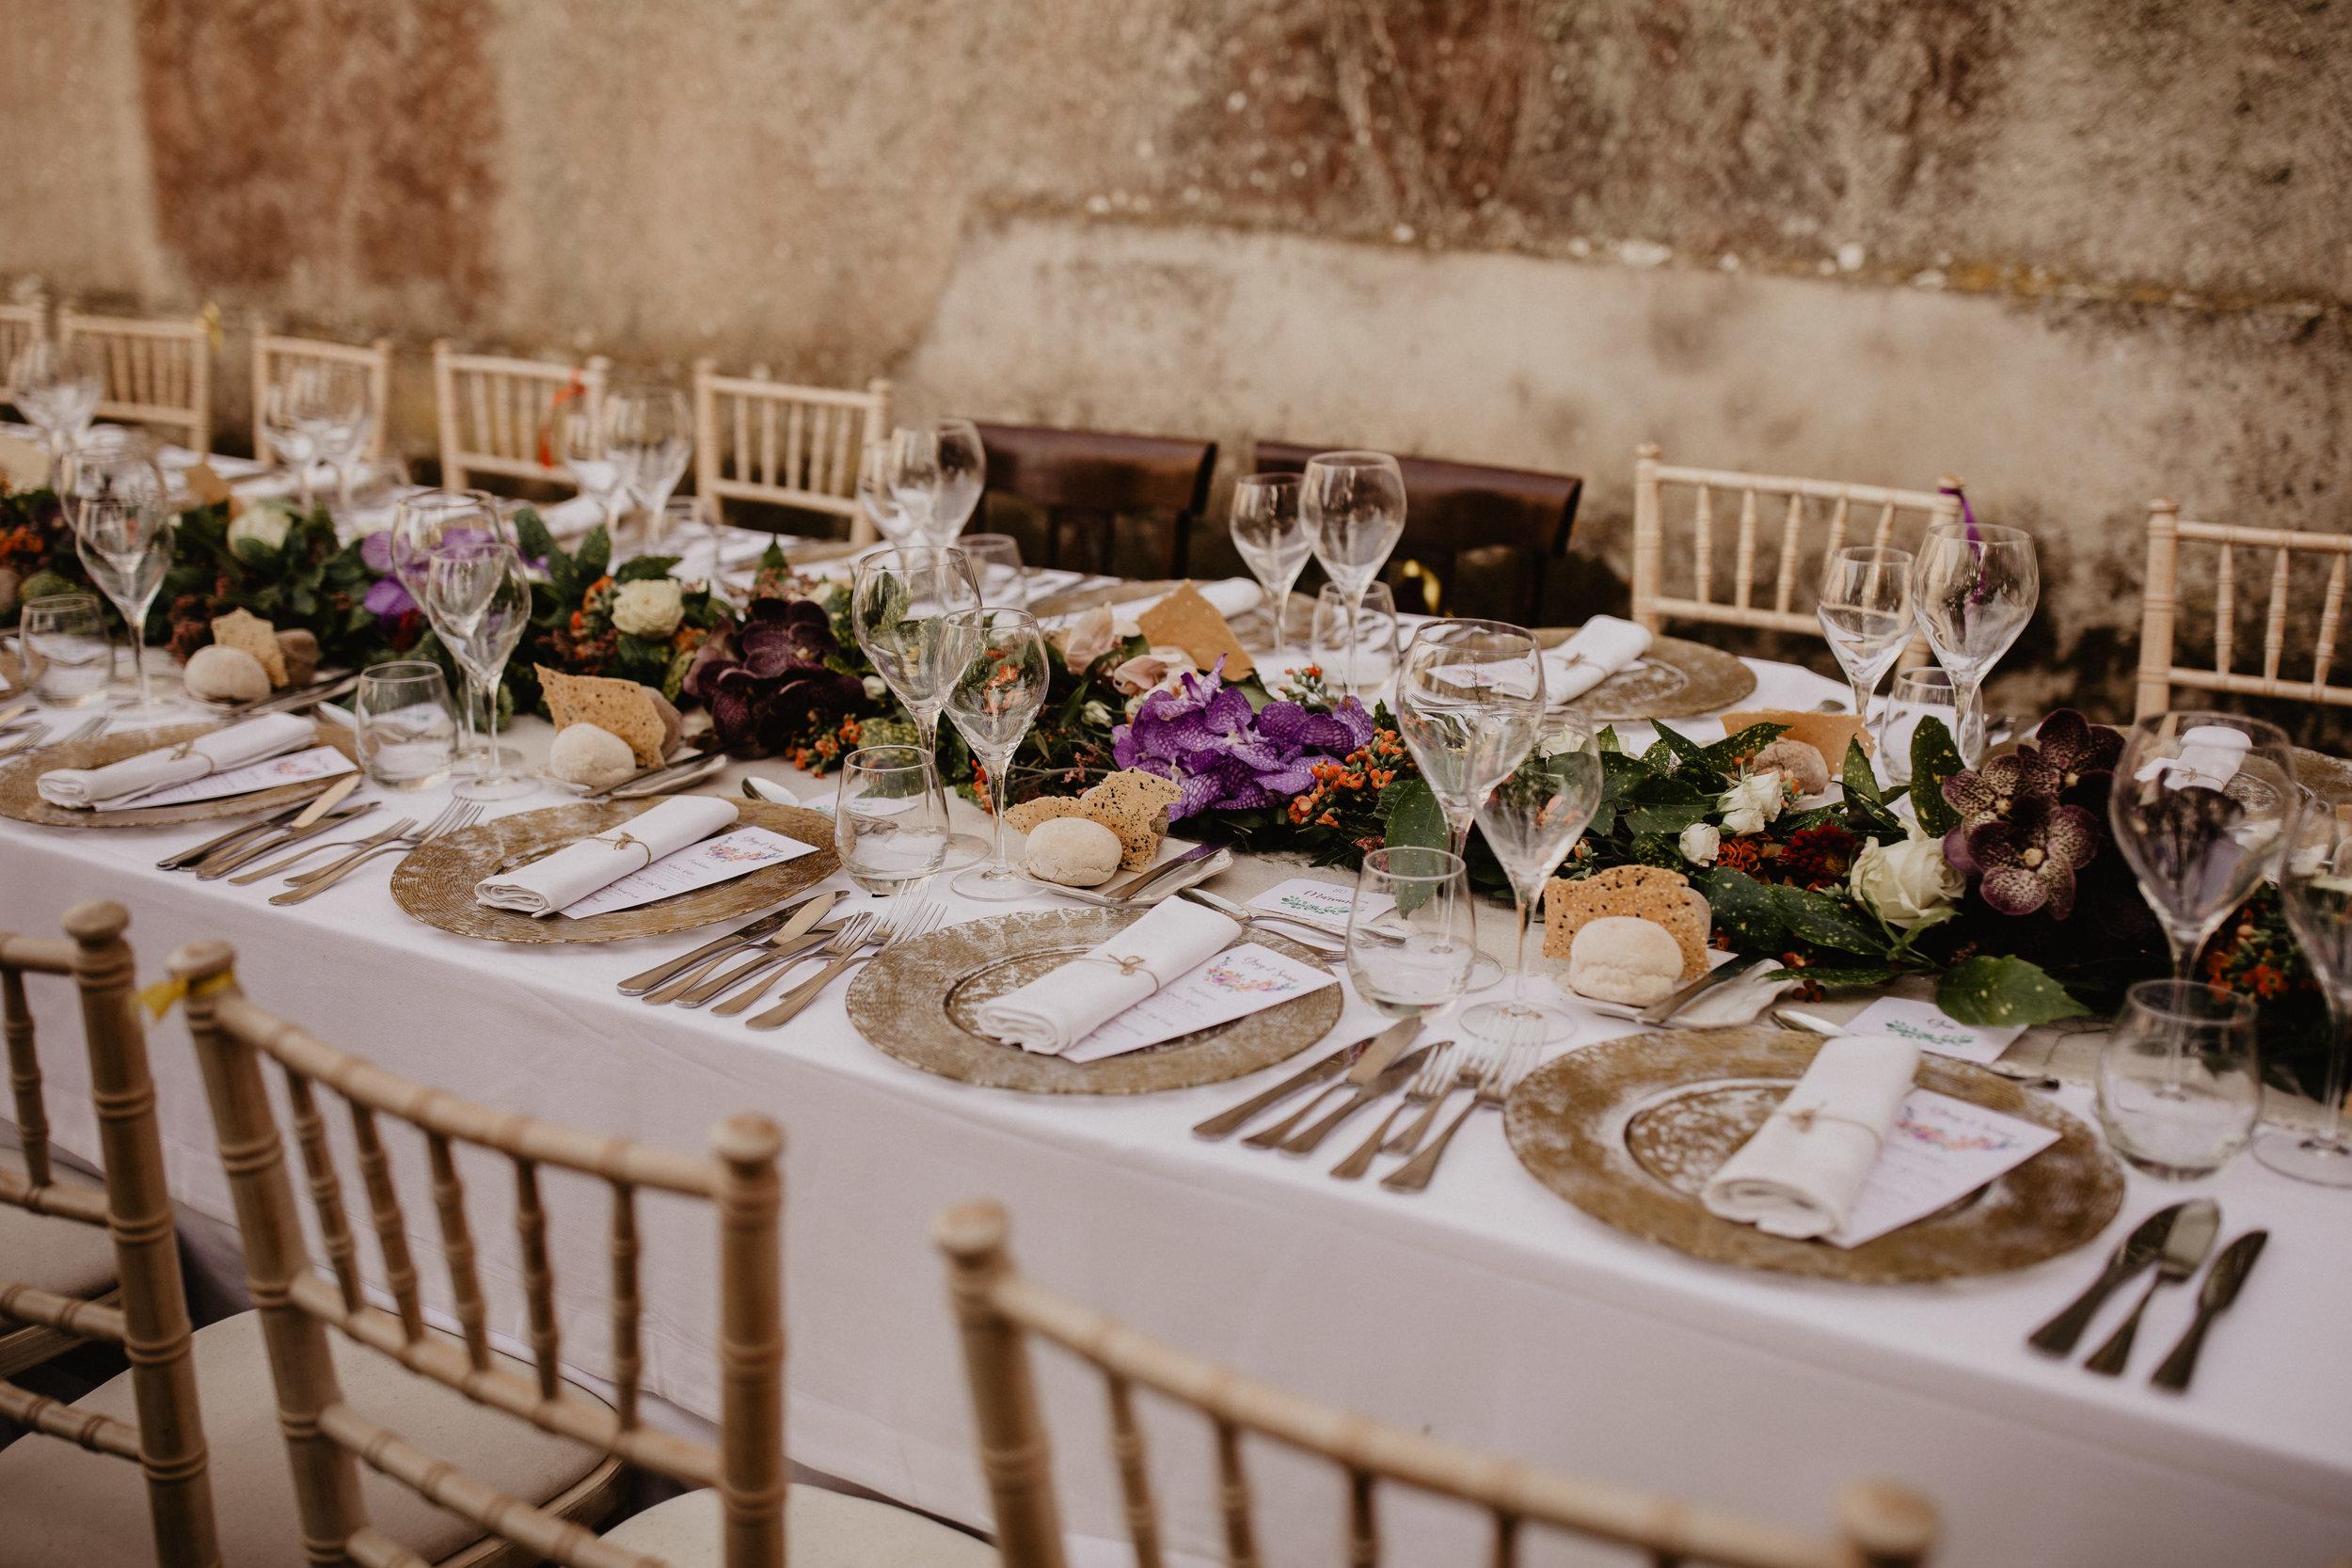 Lapela-photography-wedding-sintra-portugal-91.jpg